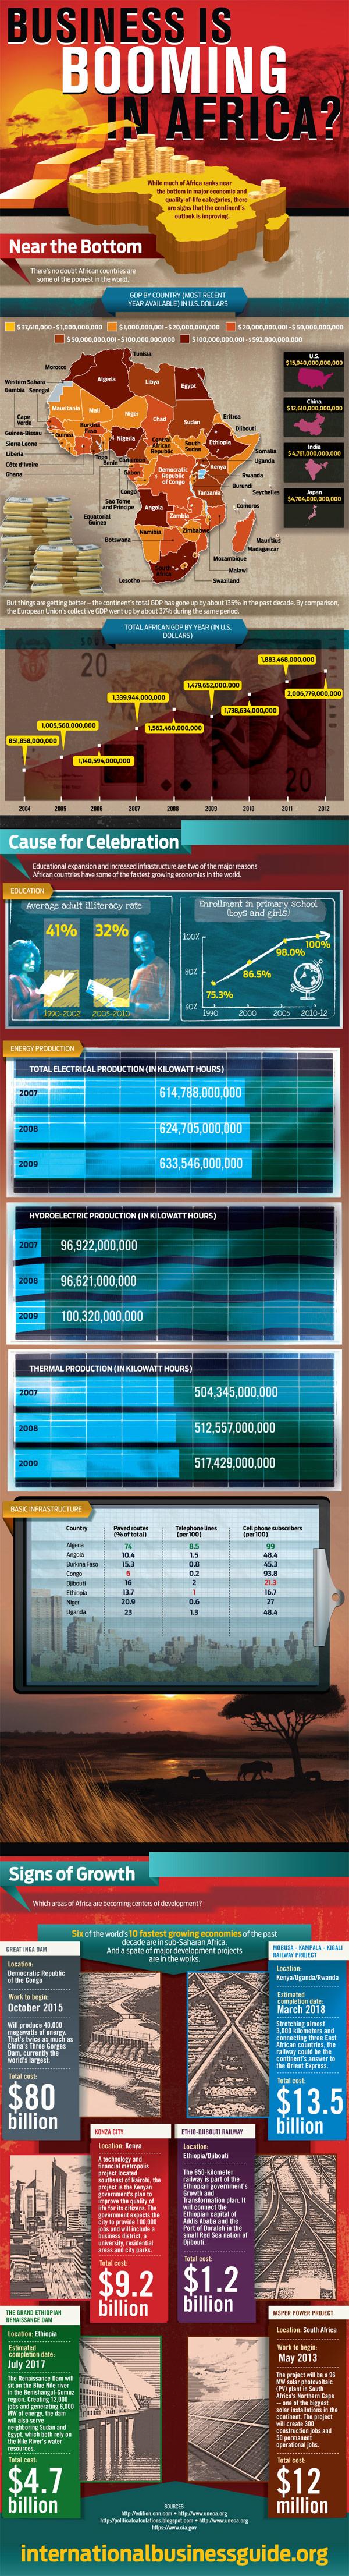 Economic Development in Africa-Infographic